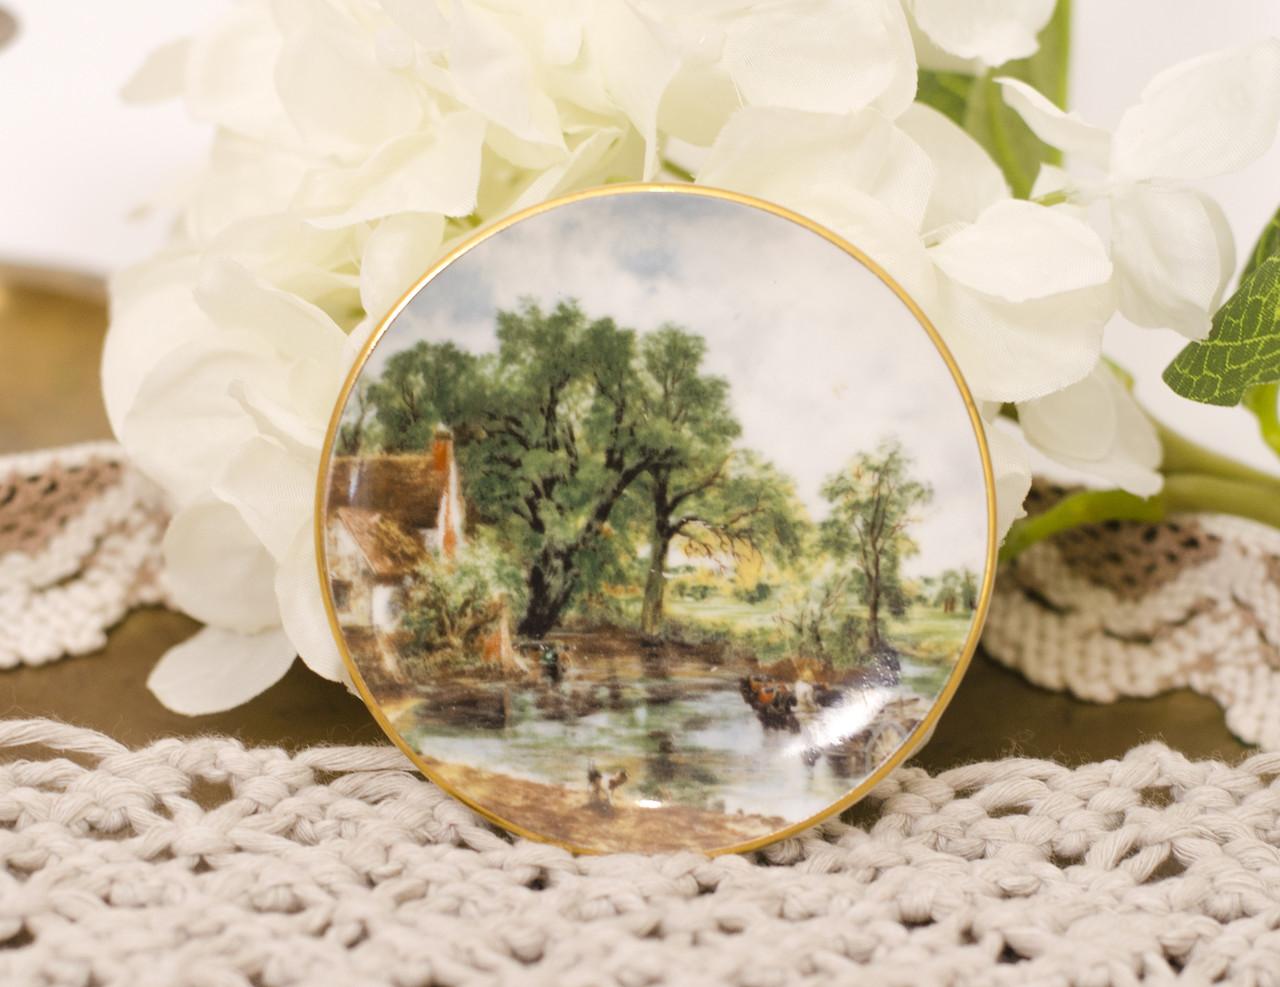 Фарфоровая тарелочка с сельским пейзажем, розетка, фарфор, Англия, GROWN STAFFS